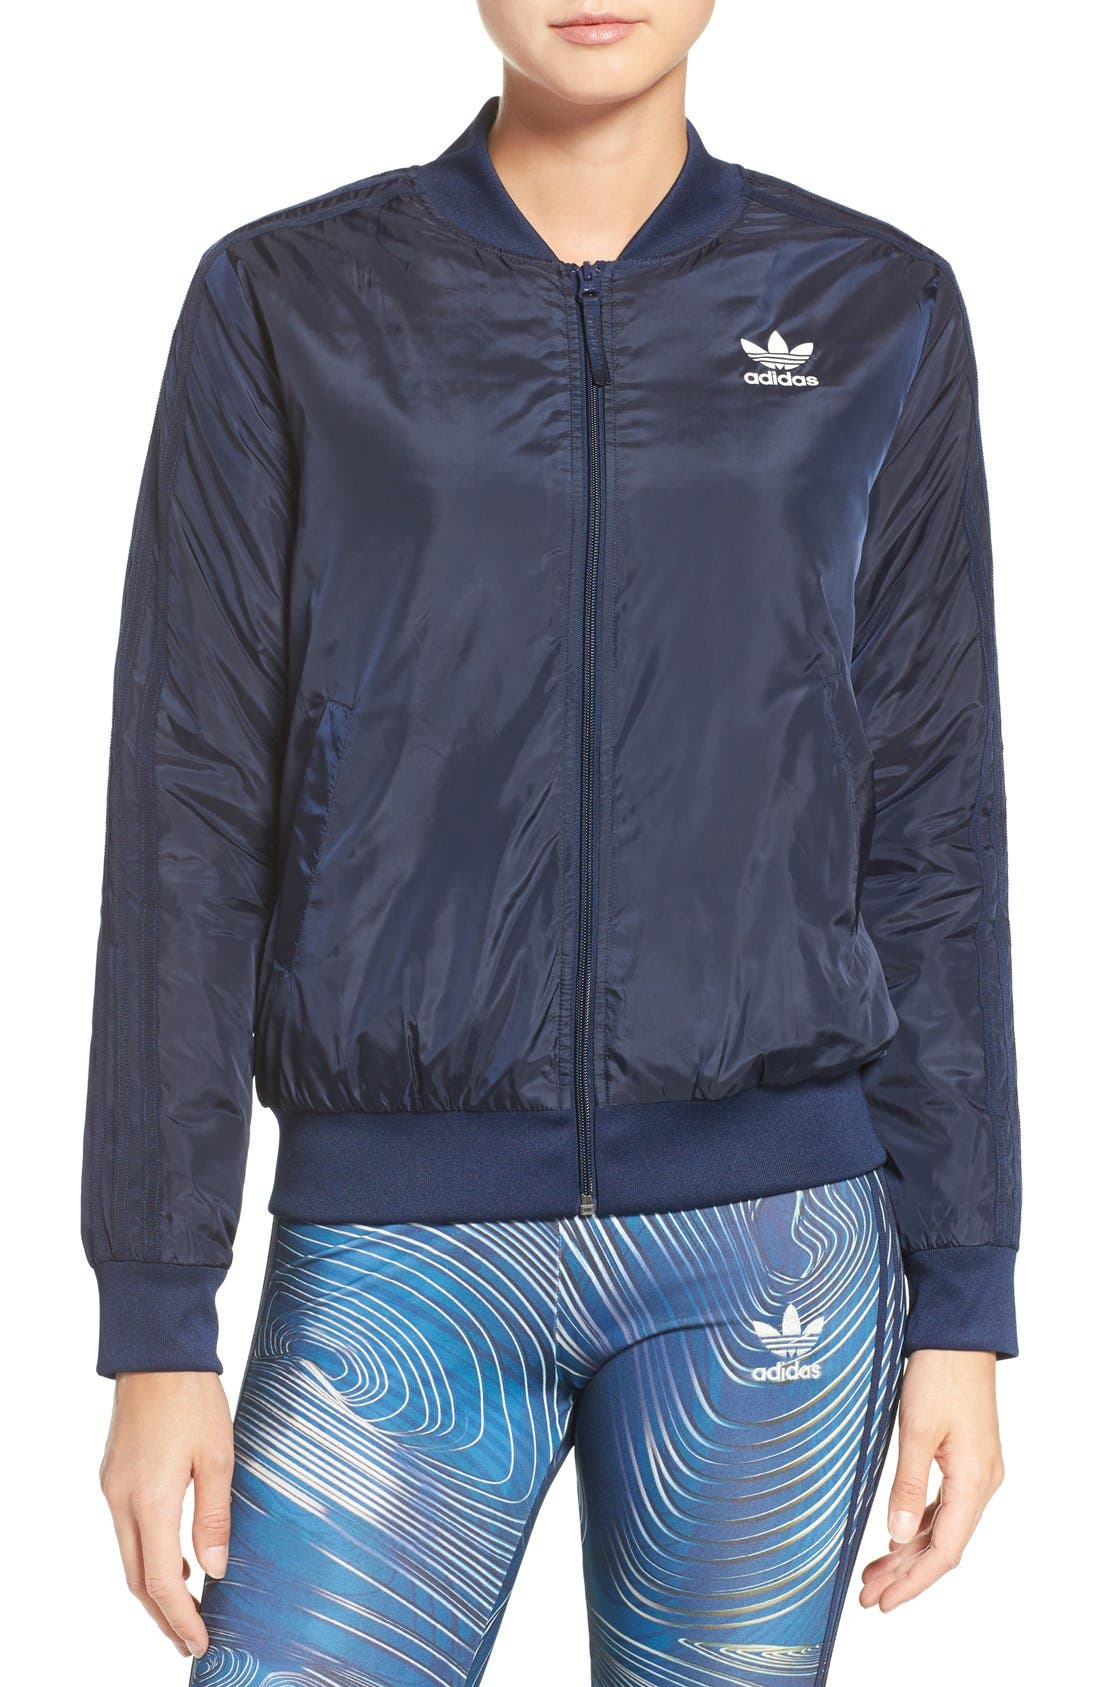 Main Image - adidas Originals 'BG' 3-Stripes Bomber Jacket